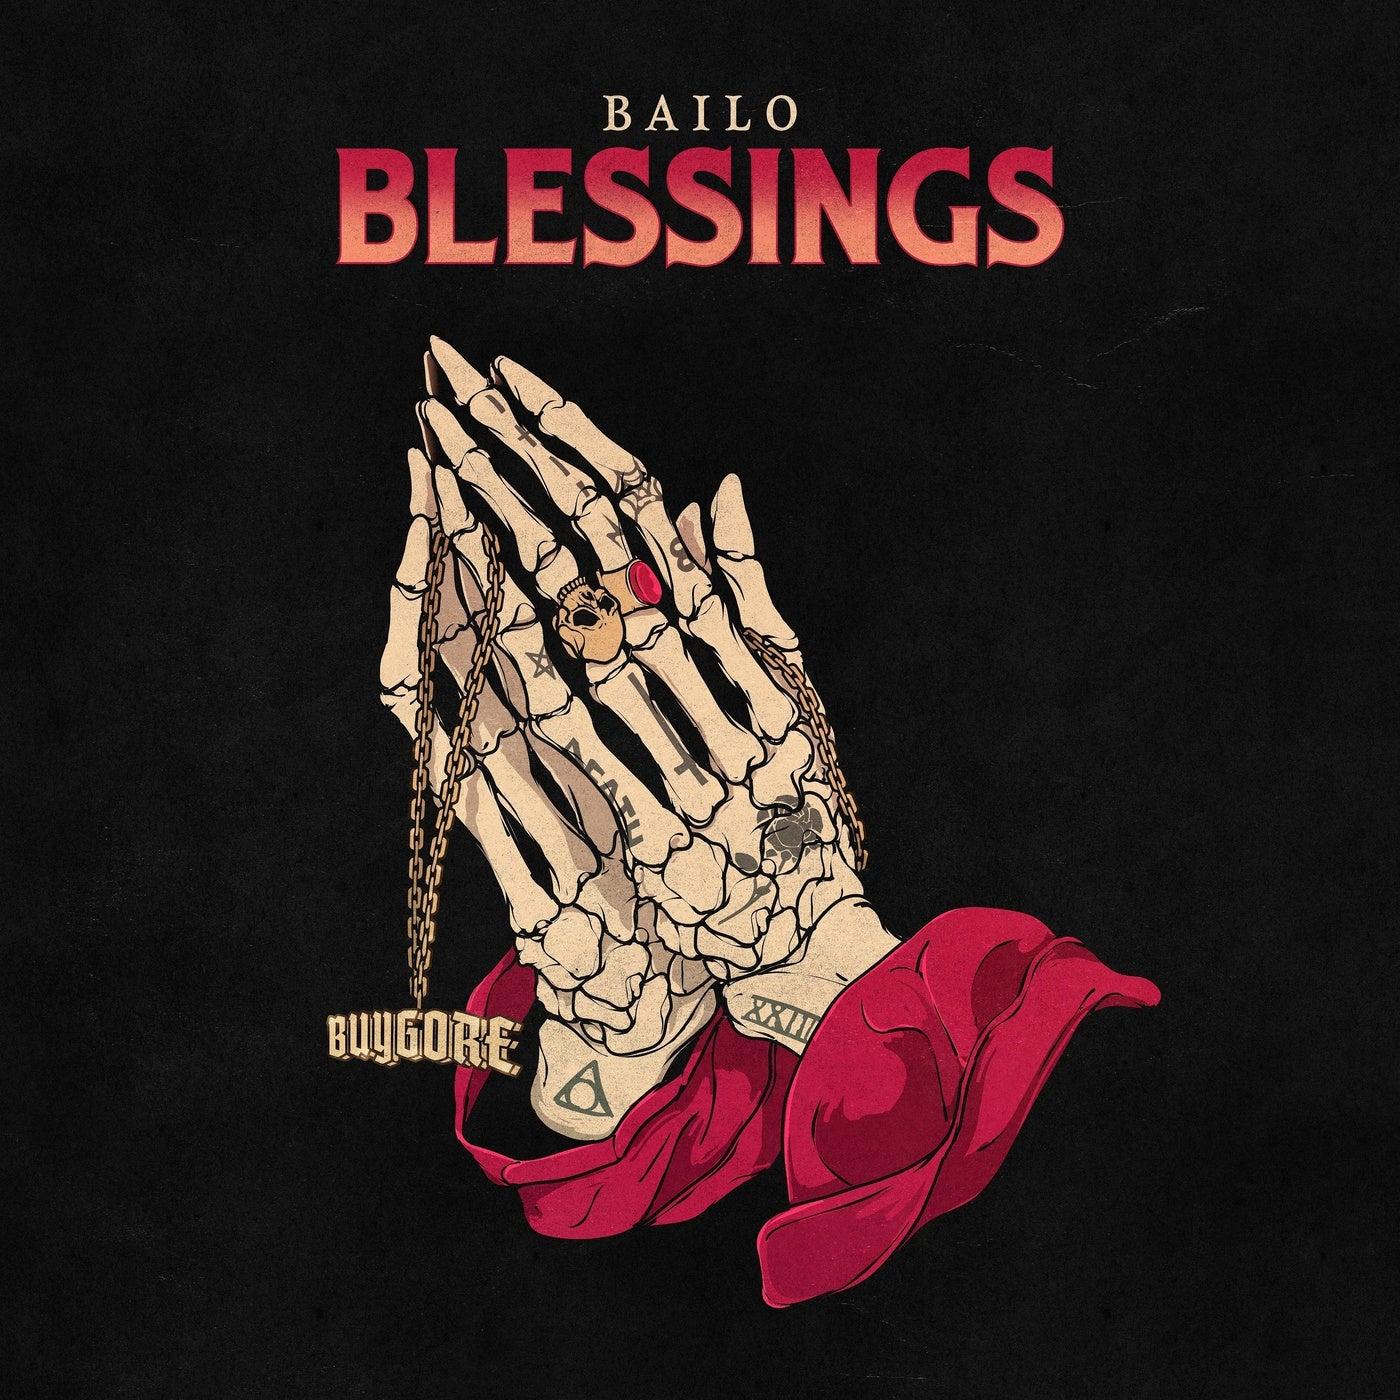 BLESSINGS (Original Mix)